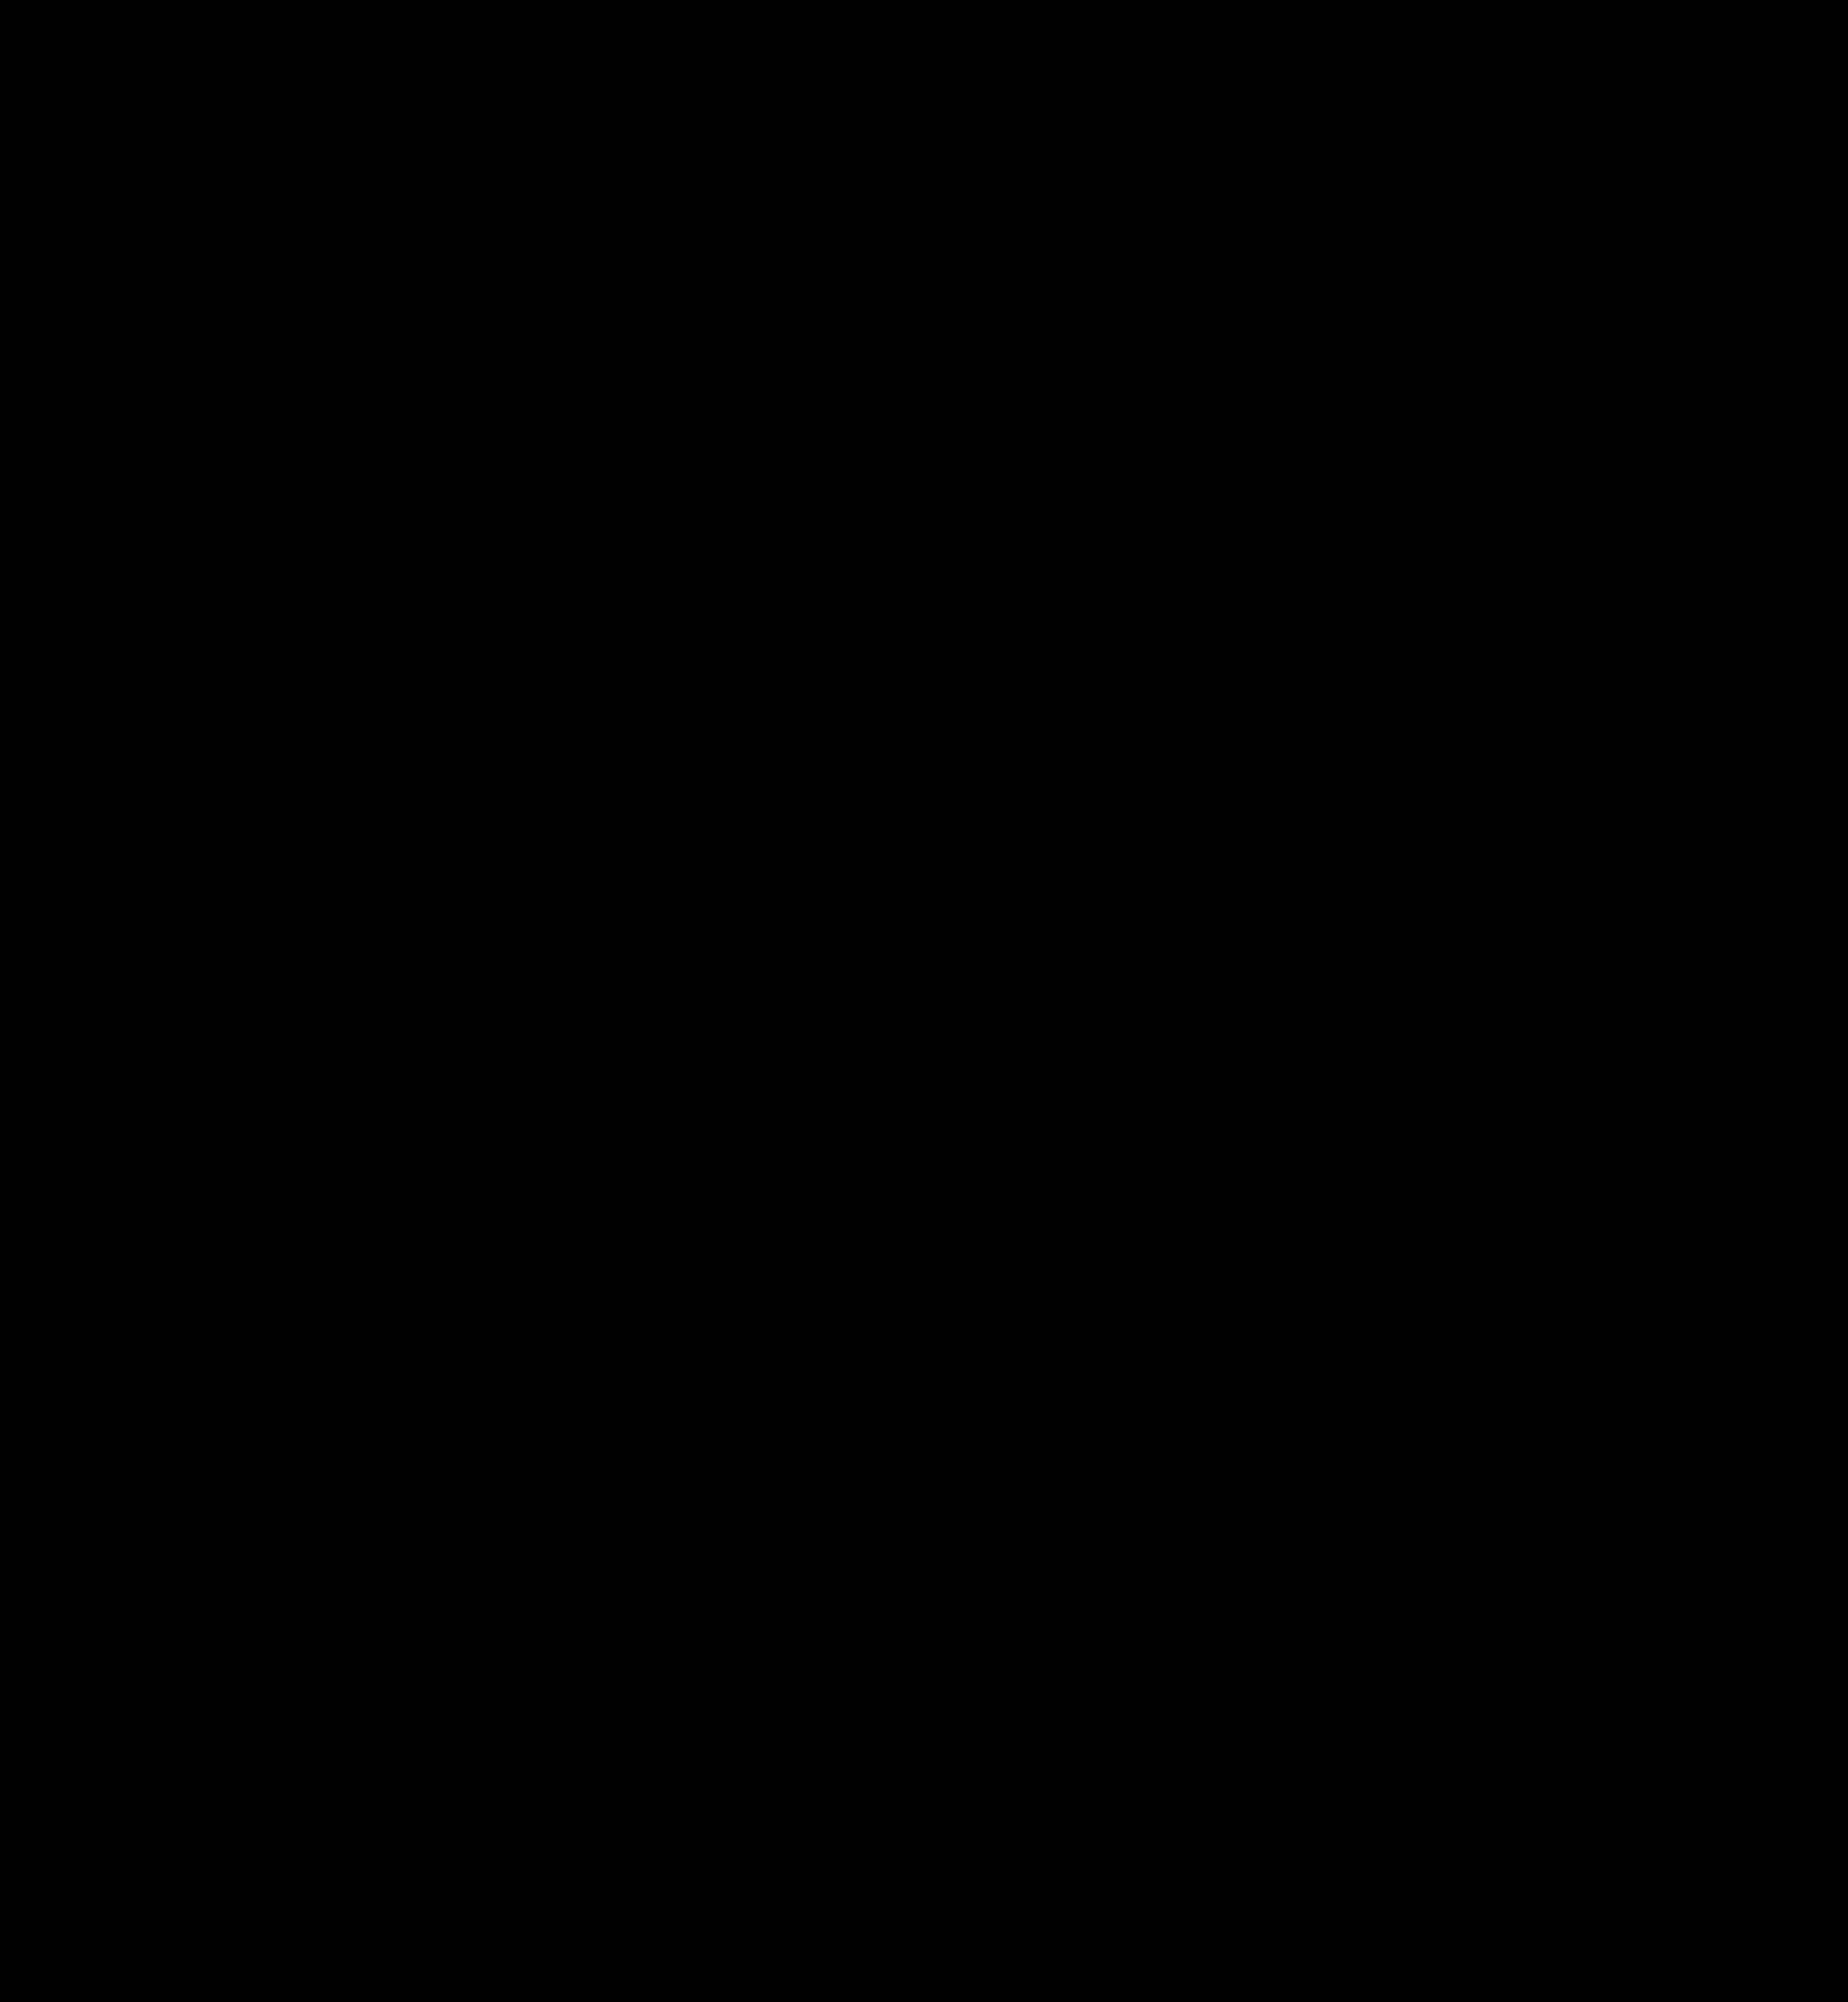 2080x2253 Skateboard clipart silhouette